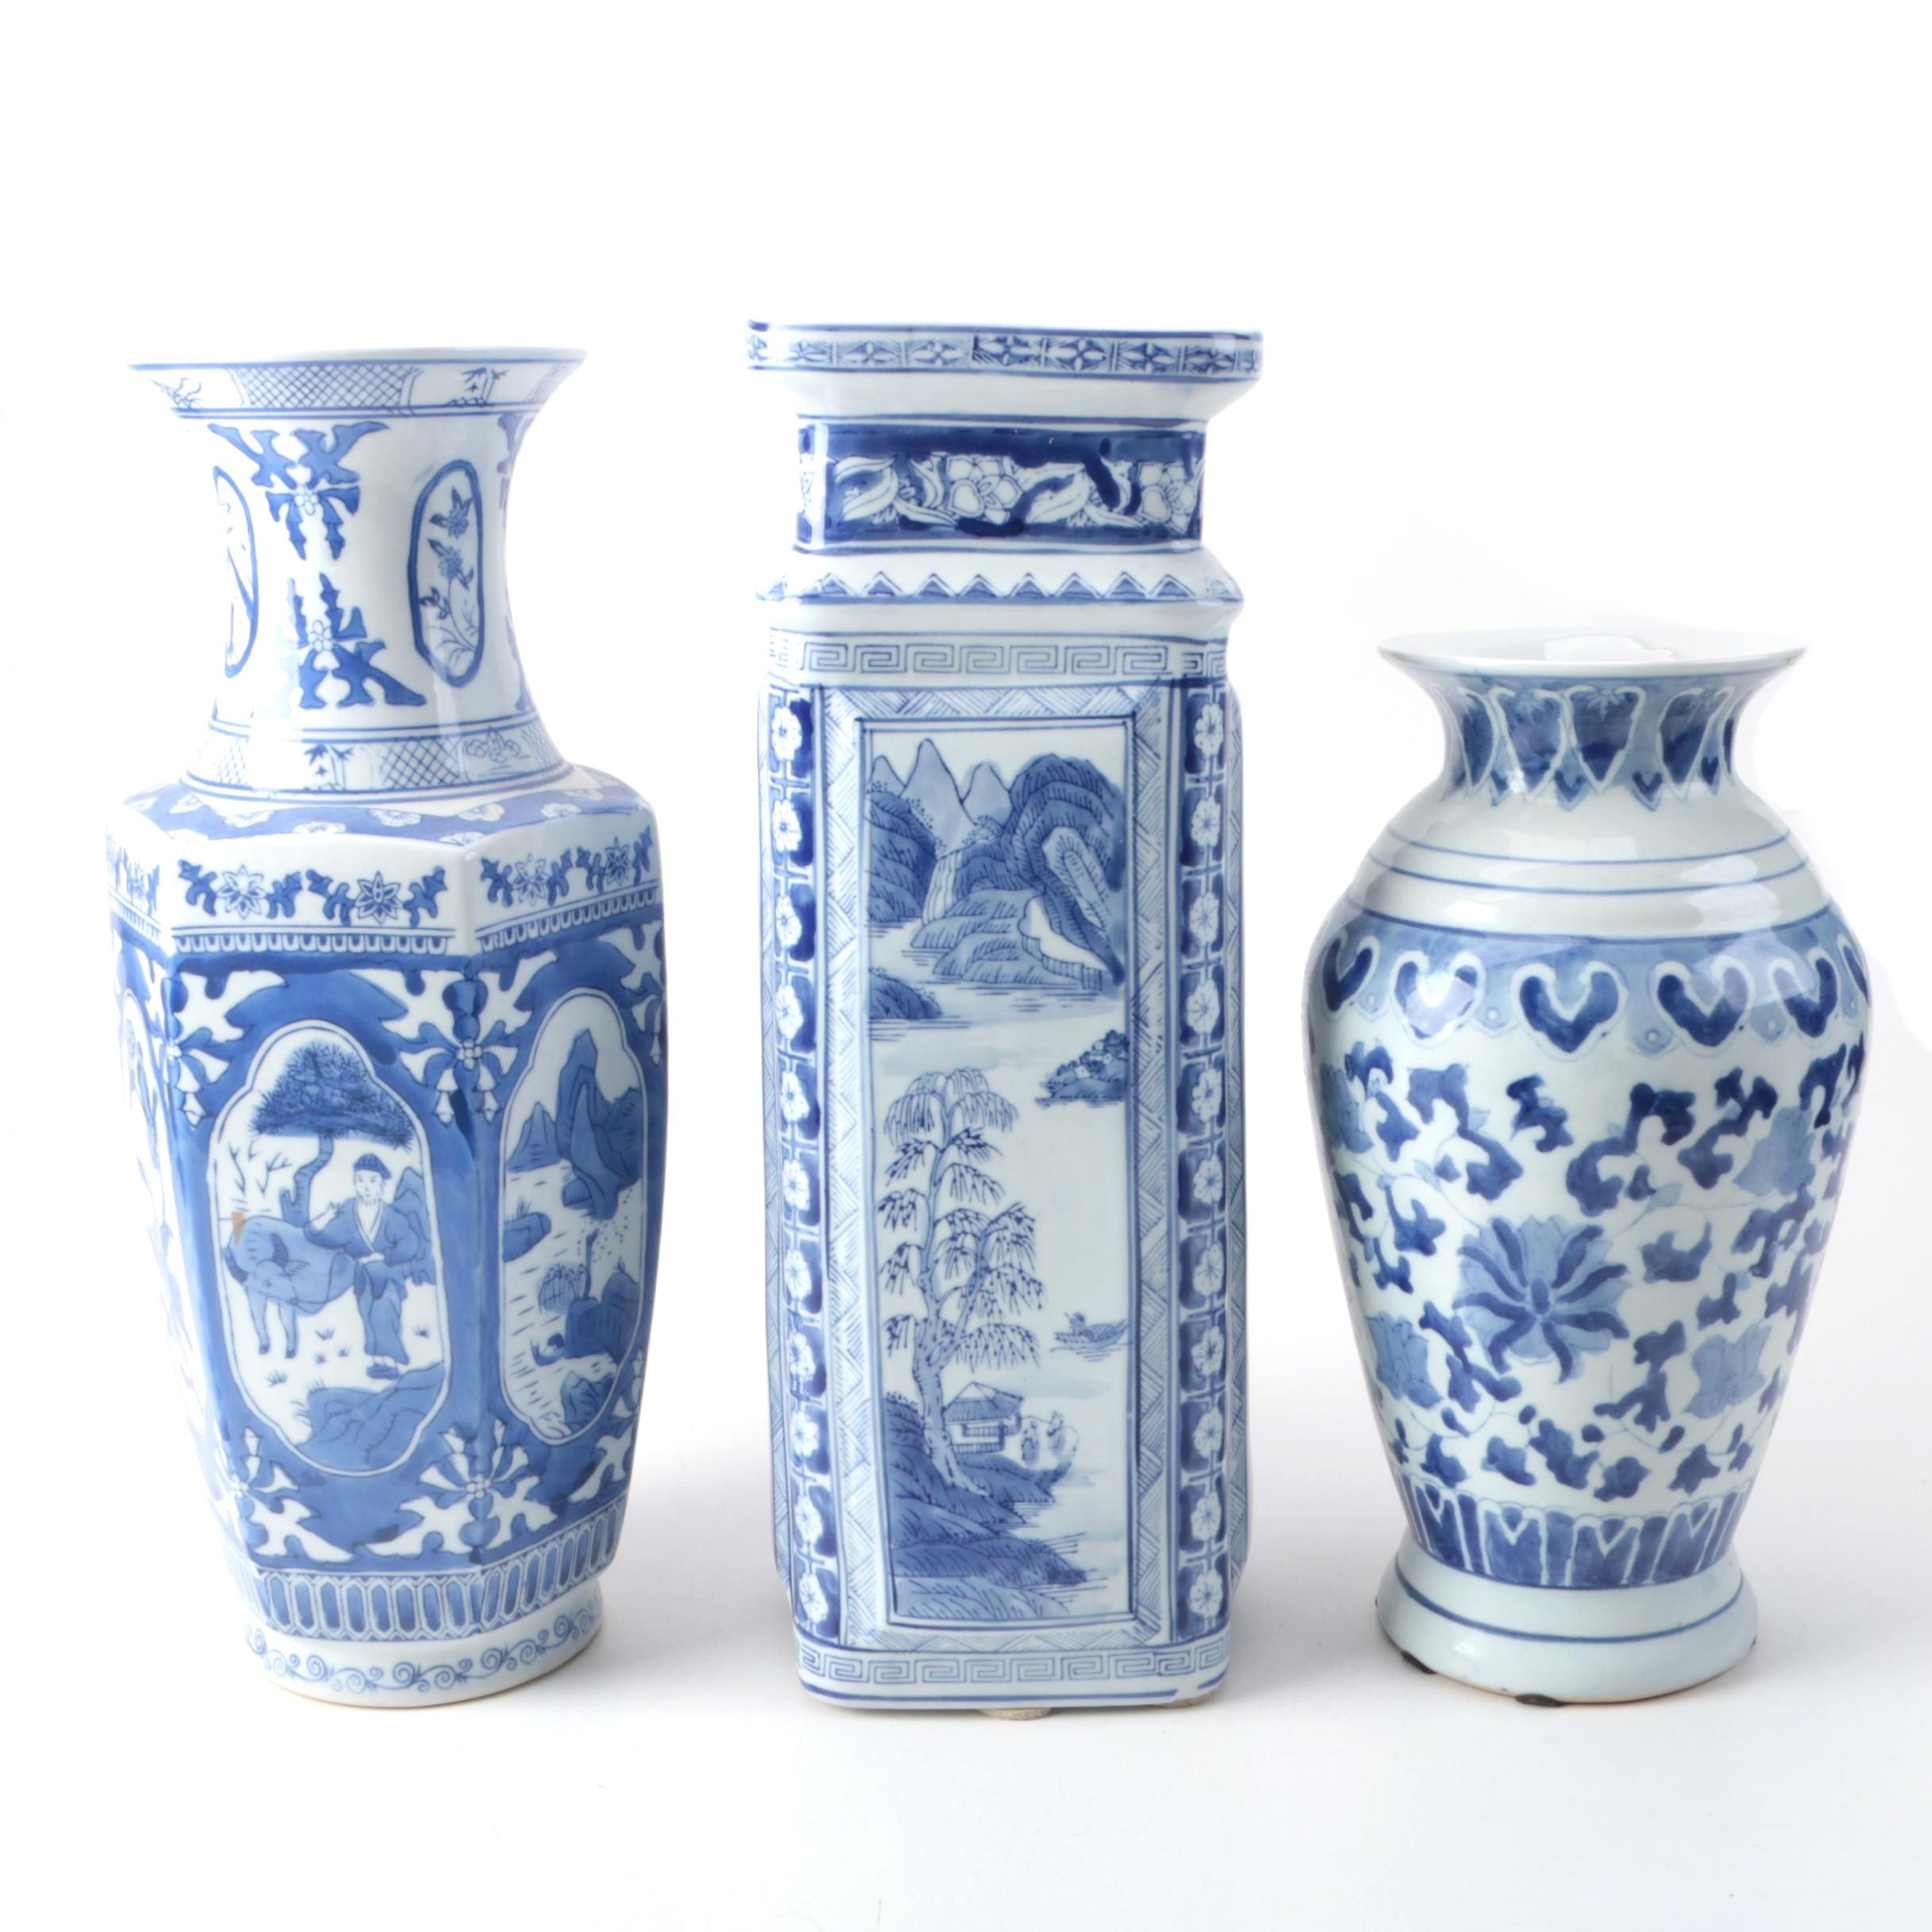 Blue and White Chinese Ceramic Vases